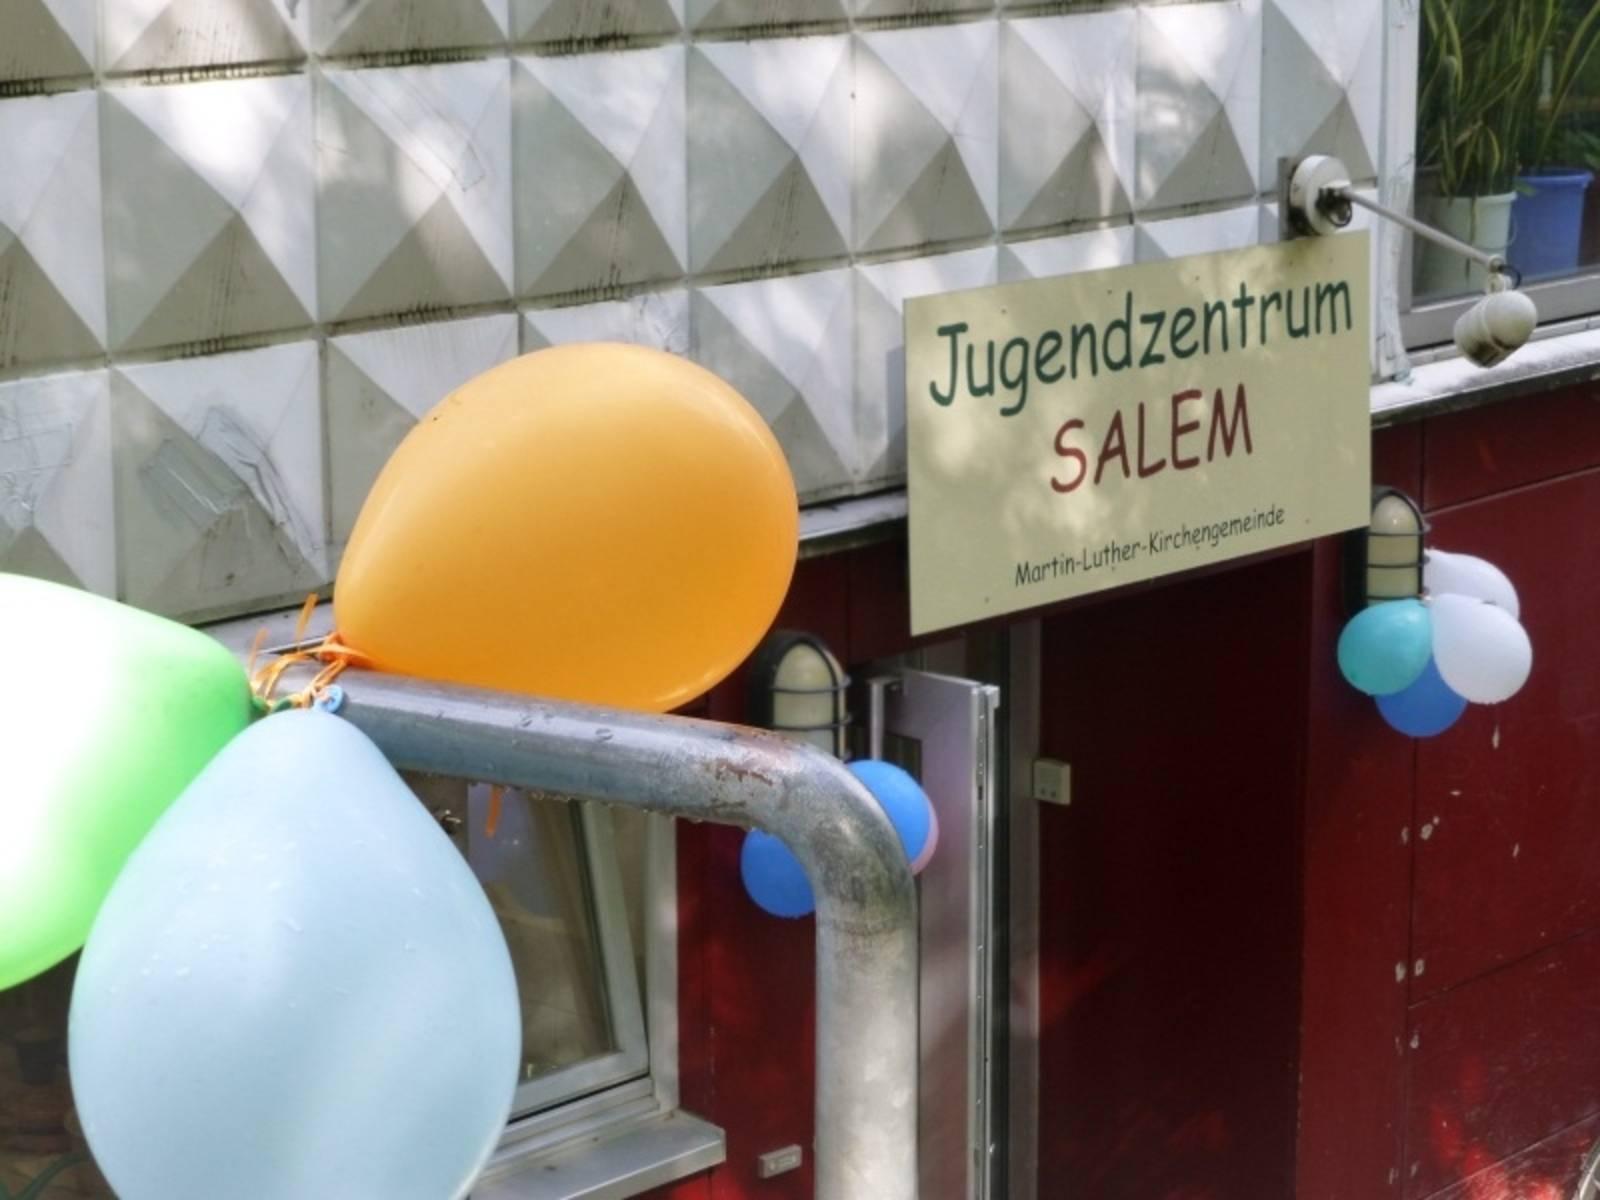 Der Eingang des Jugendzentrums Salem an dem Luftballons aufgehängt wurden.